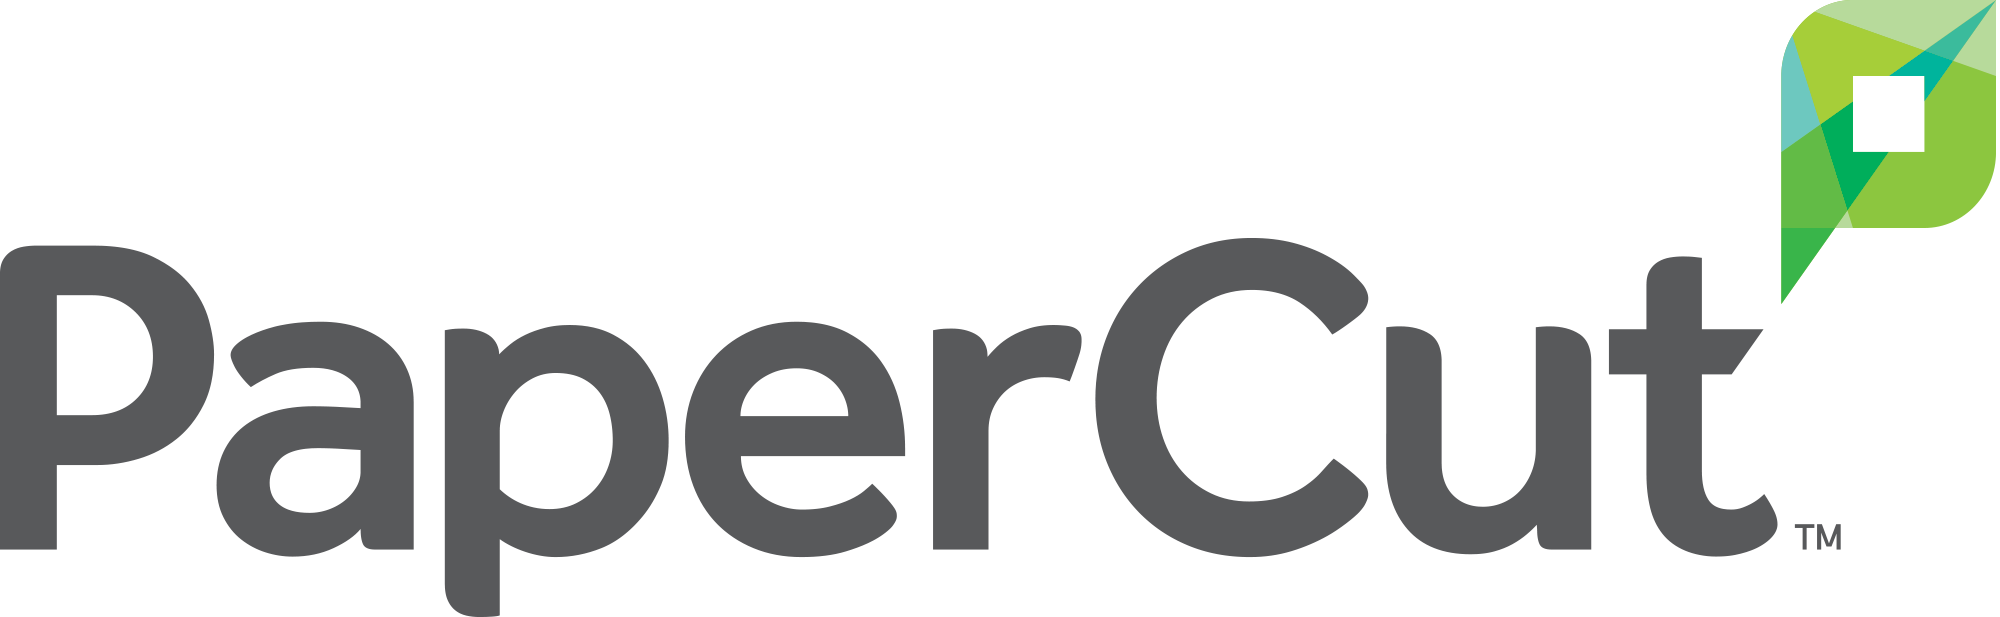 PaperCut NG 18.0.5